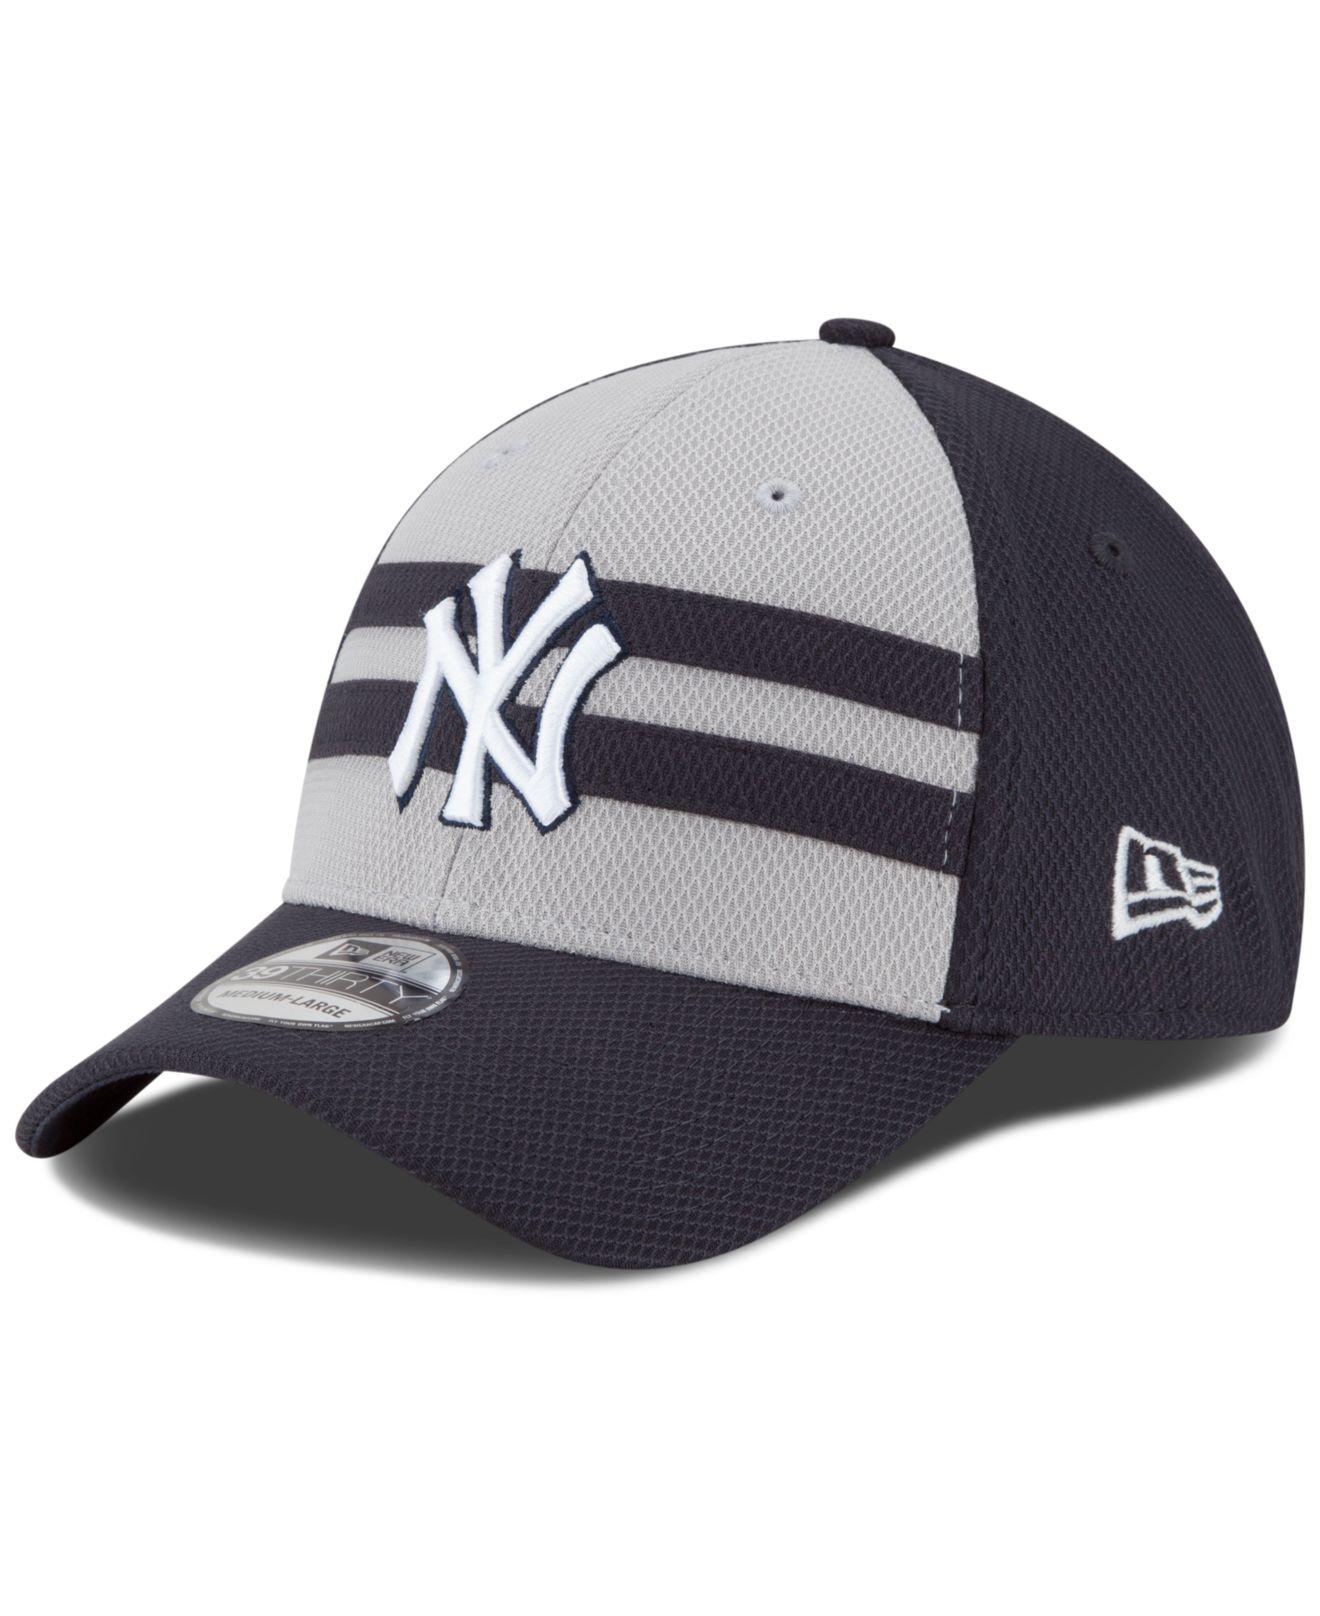 0fc68c657e6 Lyst - KTZ New York Yankees 2015 All Star Game 39thirty Cap in Blue ...